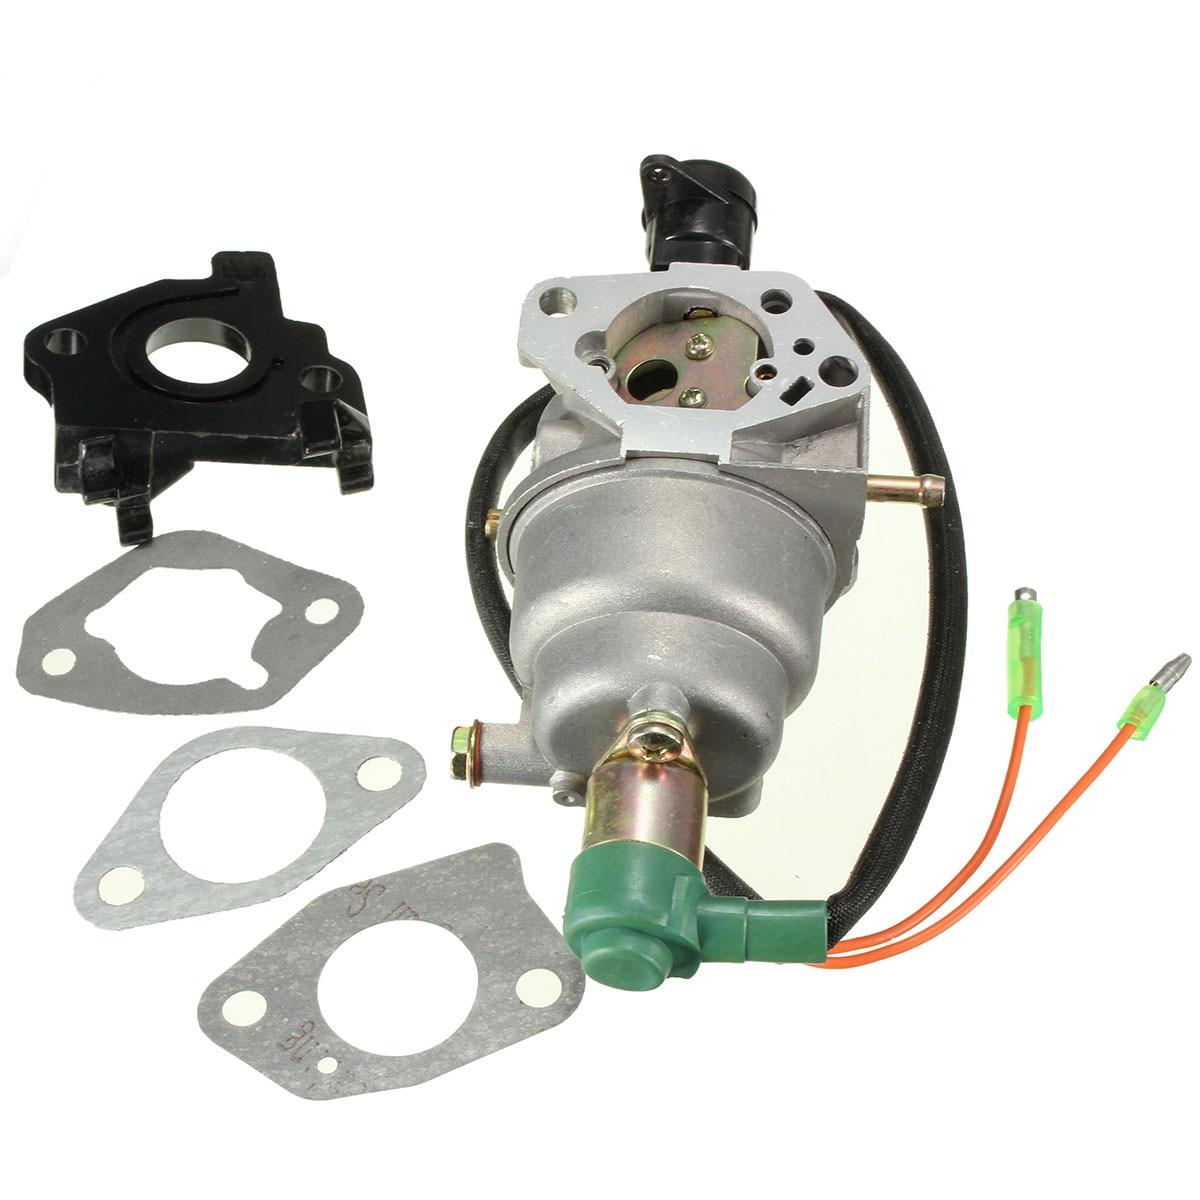 best carburetor kinzo list and get free shipping - List LED i10